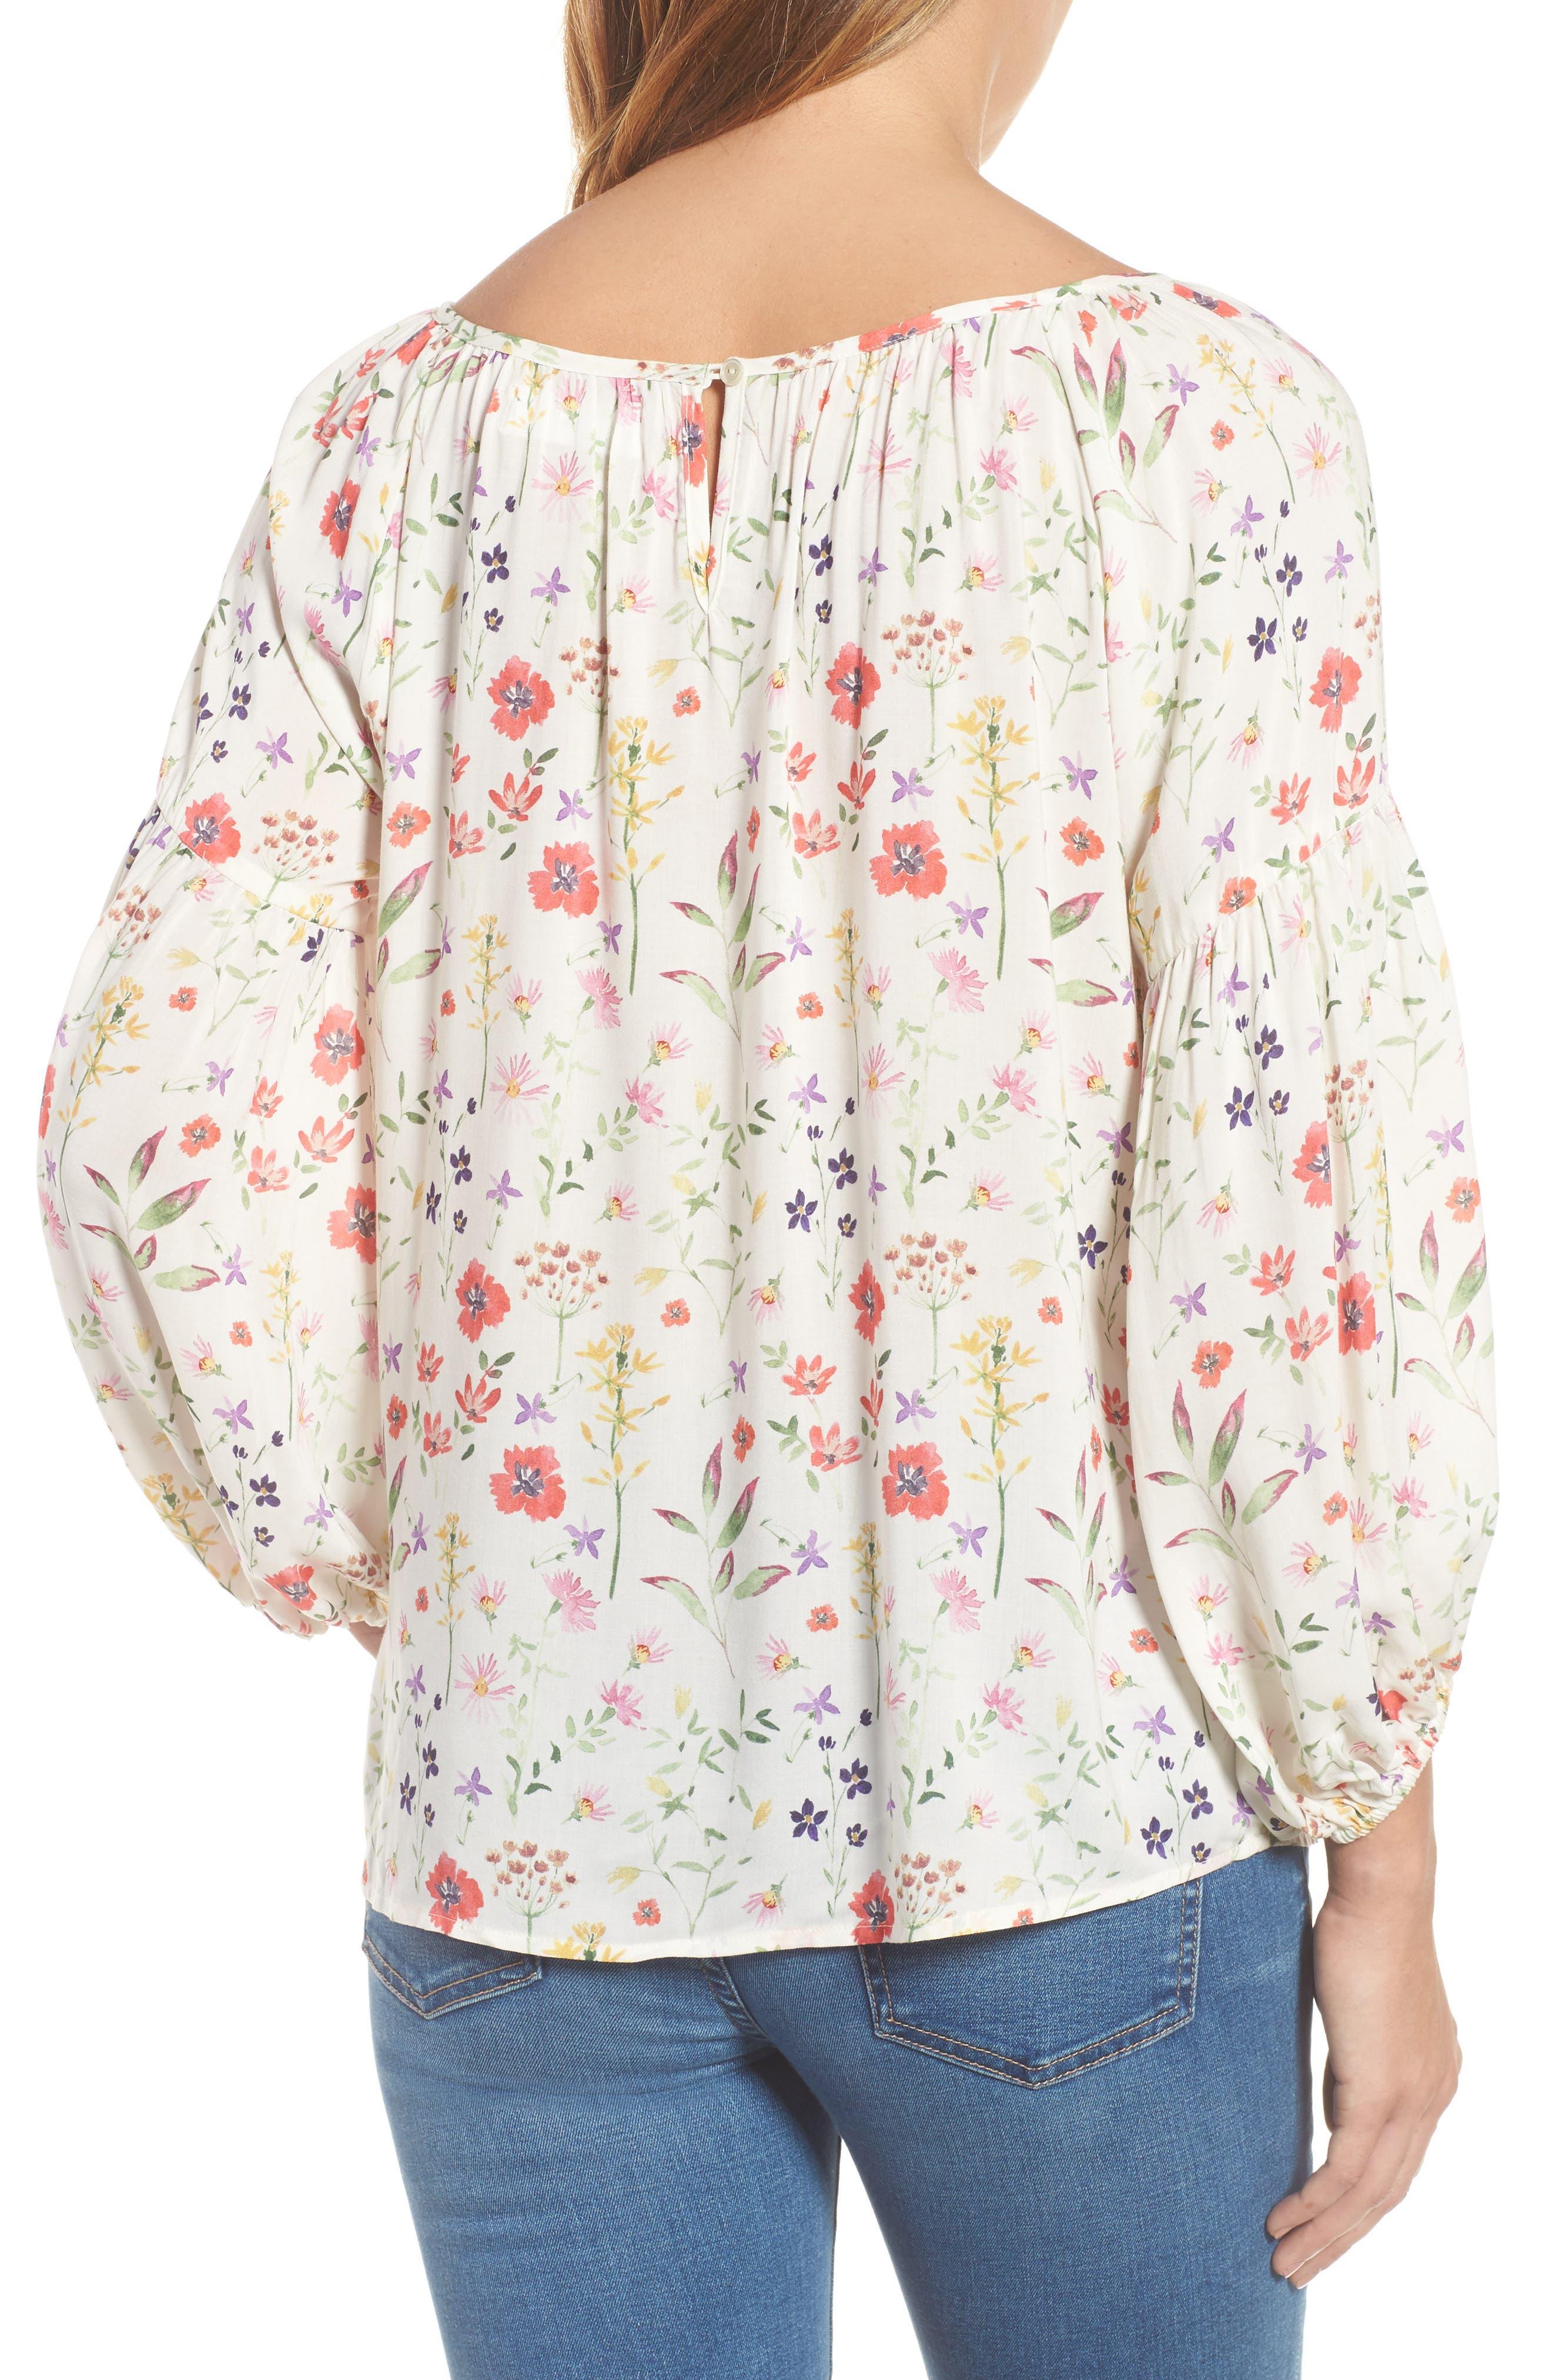 Spring Floral Peasant Top,                             Alternate thumbnail 3, color,                             White Multi